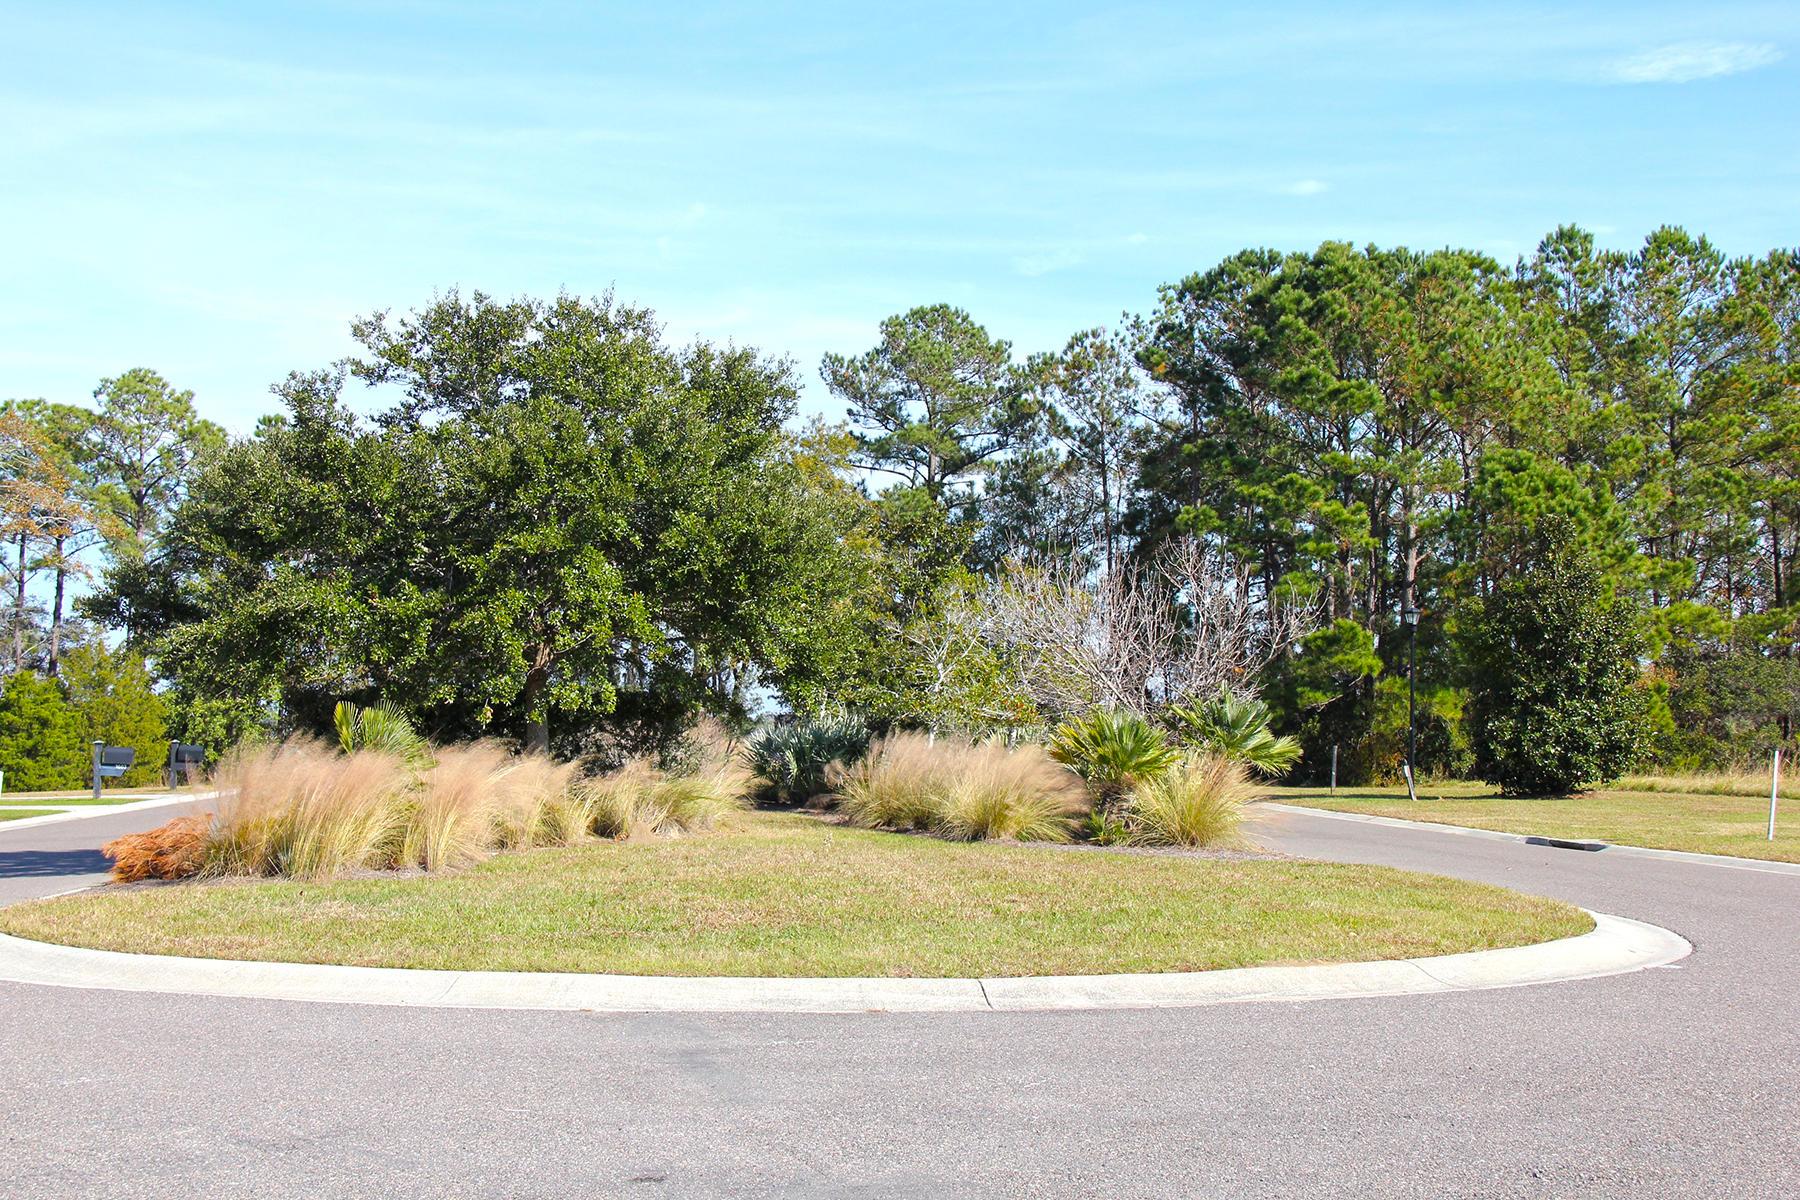 Home for sale 1604 Bernier Commons , Rushland, Johns Island, SC